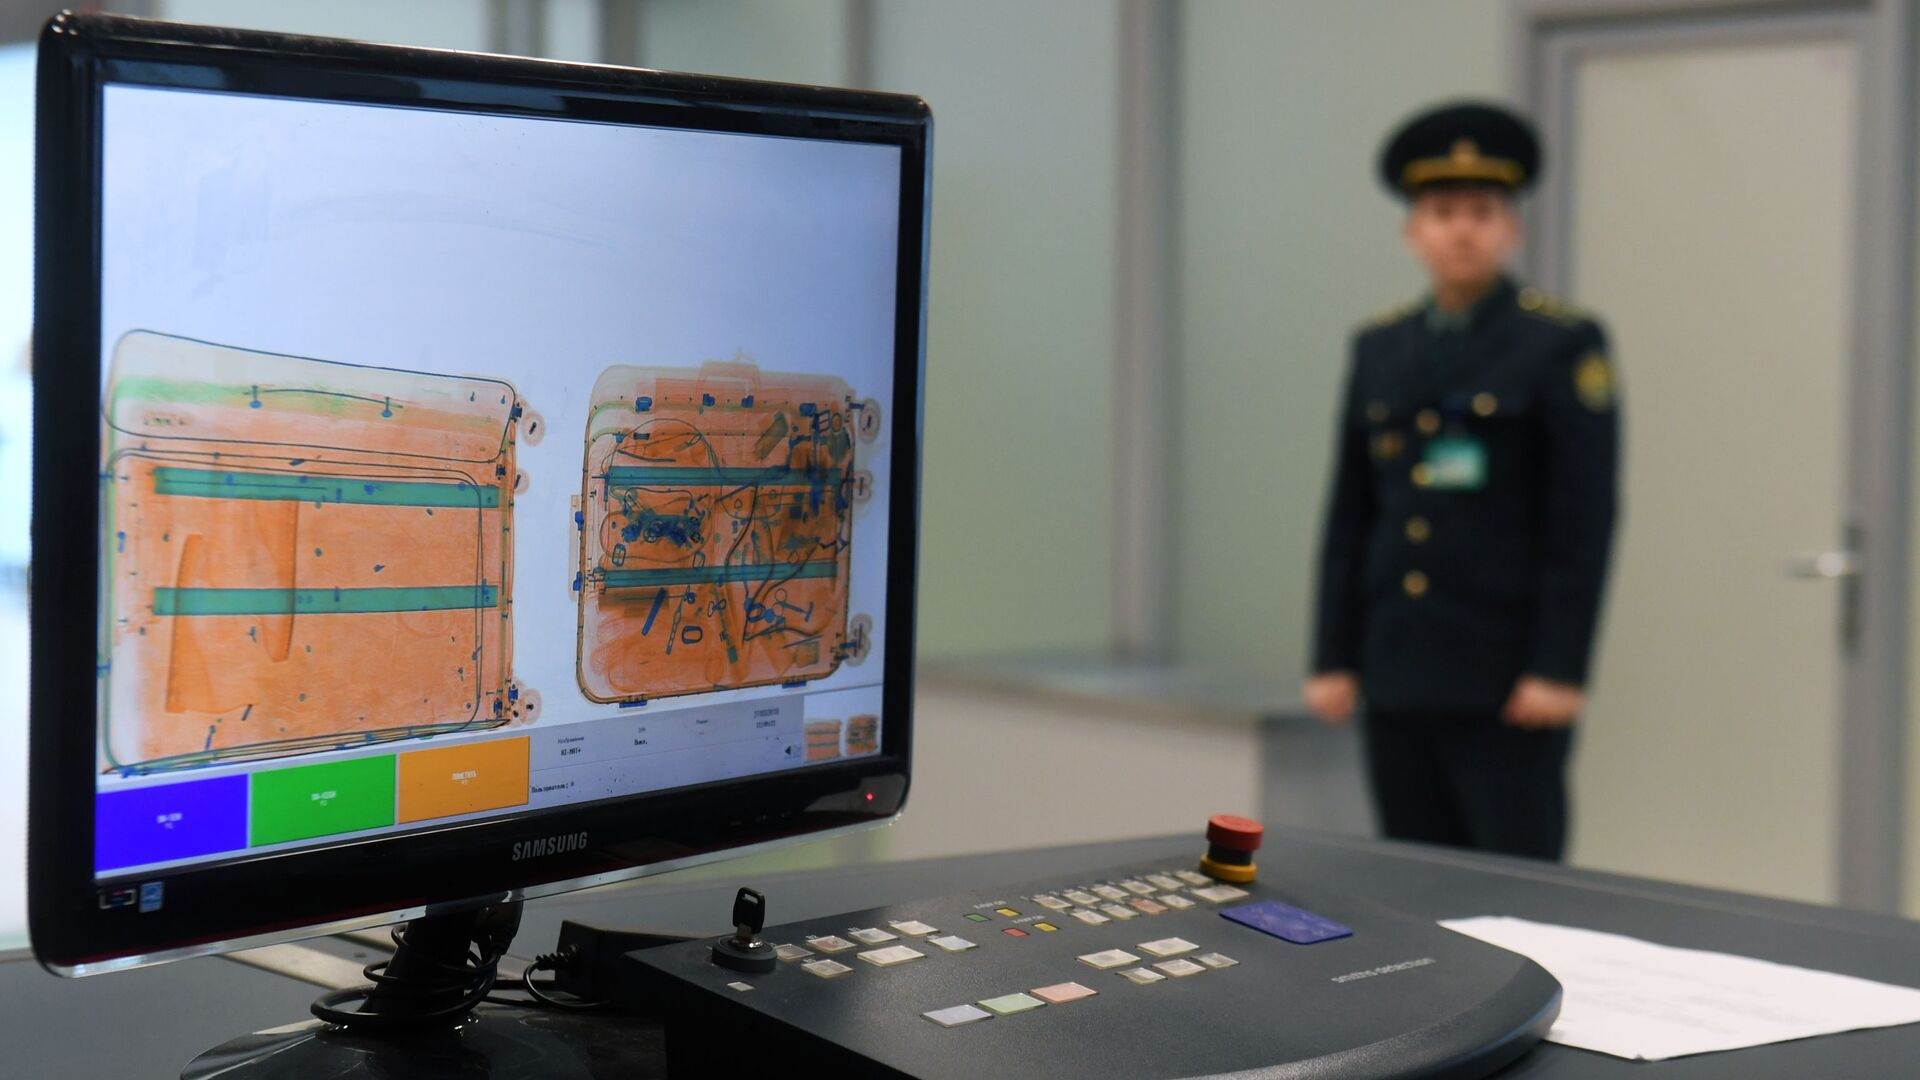 Монитор багажного сканера (интроскоп) в зоне таможенного контроля  - Sputnik Таджикистан, 1920, 27.07.2021